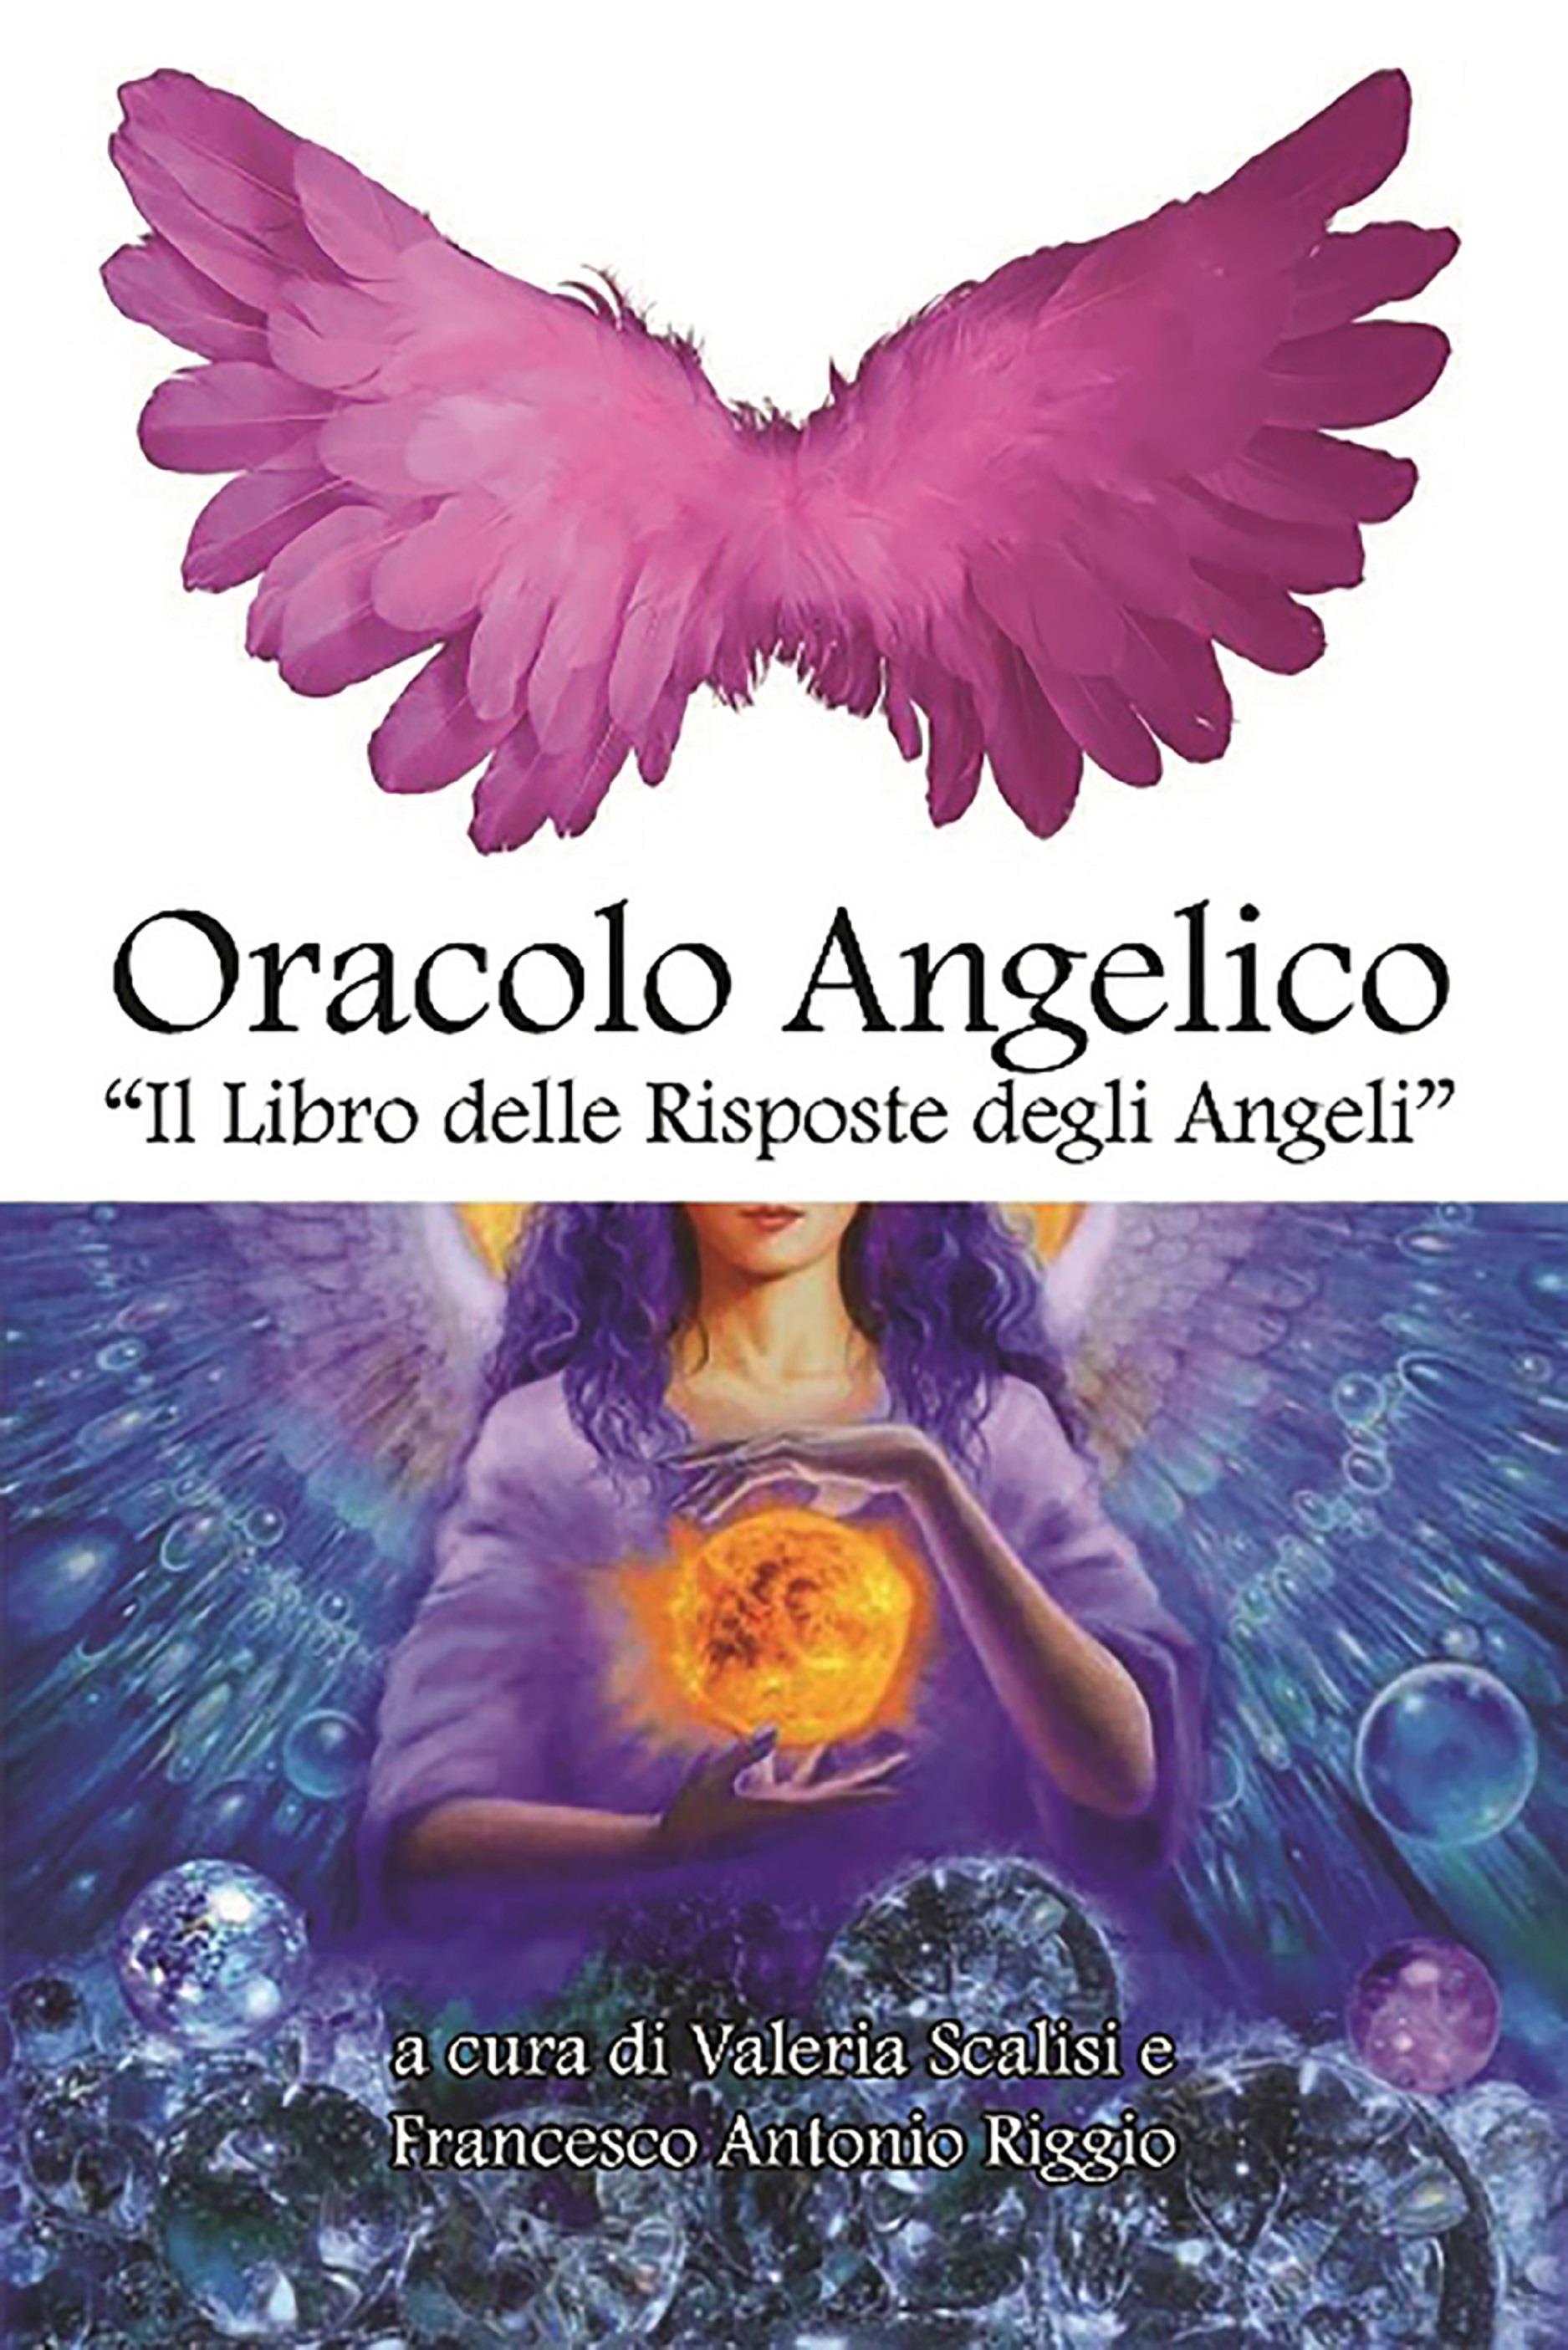 Libro Oracolo Angelico